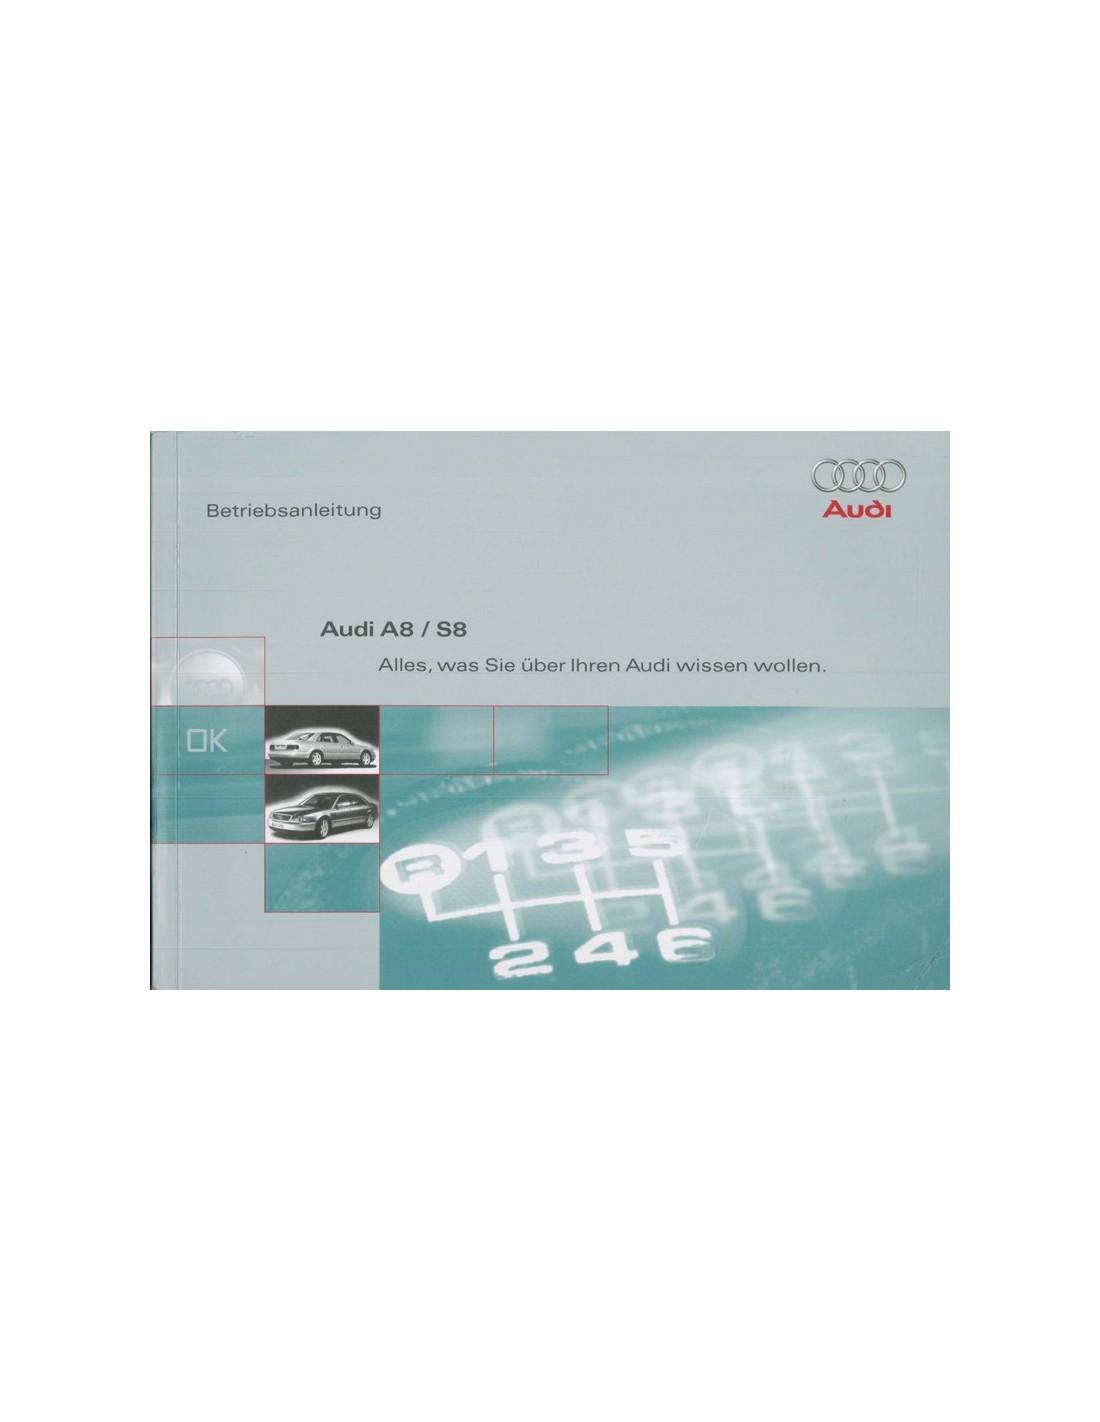 2000 audi a8 owner s manual german rh autolit eu 2008 Audi A8 audi a8 owners manual